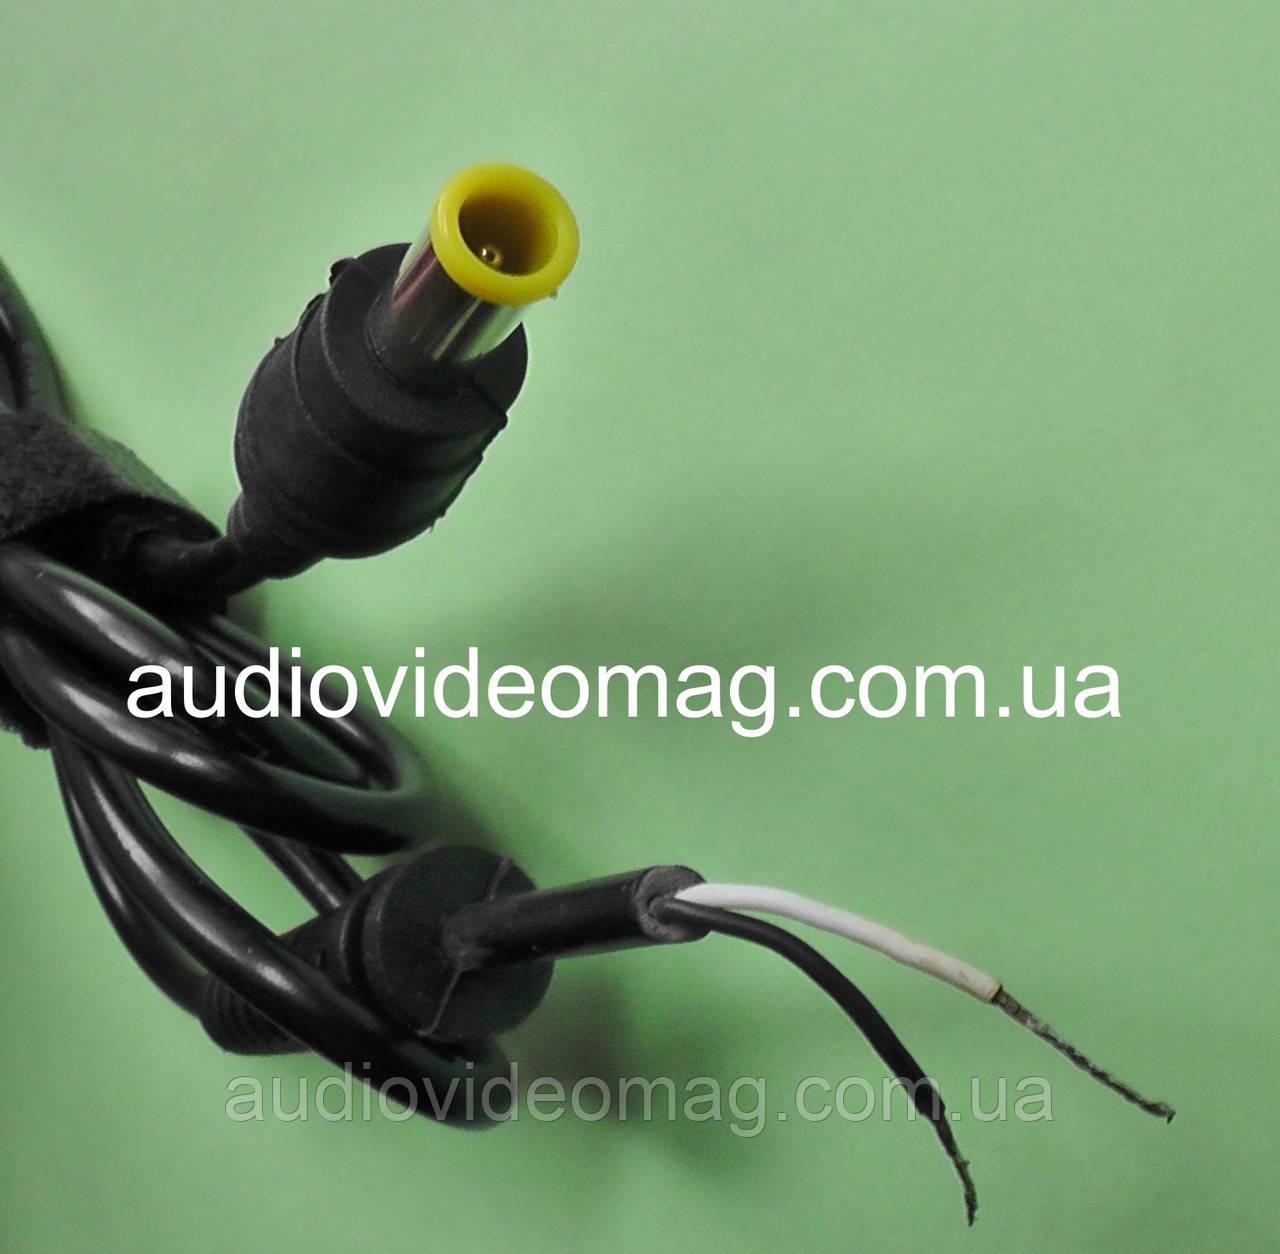 Шнур питания с штекером 6.0-4.4 со штырьком для ноутбуков Sony